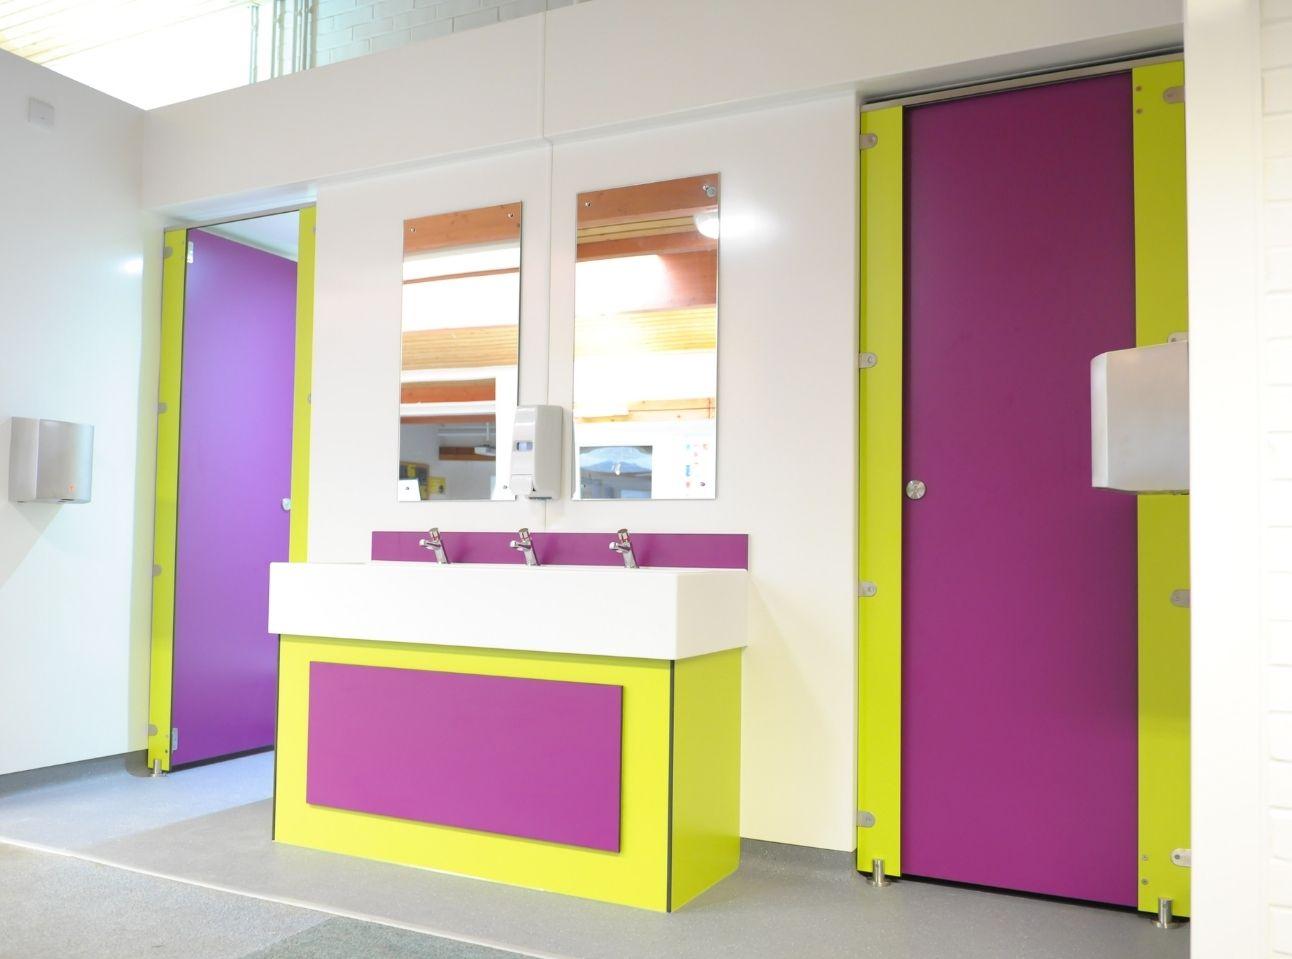 Colden Common School Toilet Refurbishment   Case Study   Commercial Washrooms